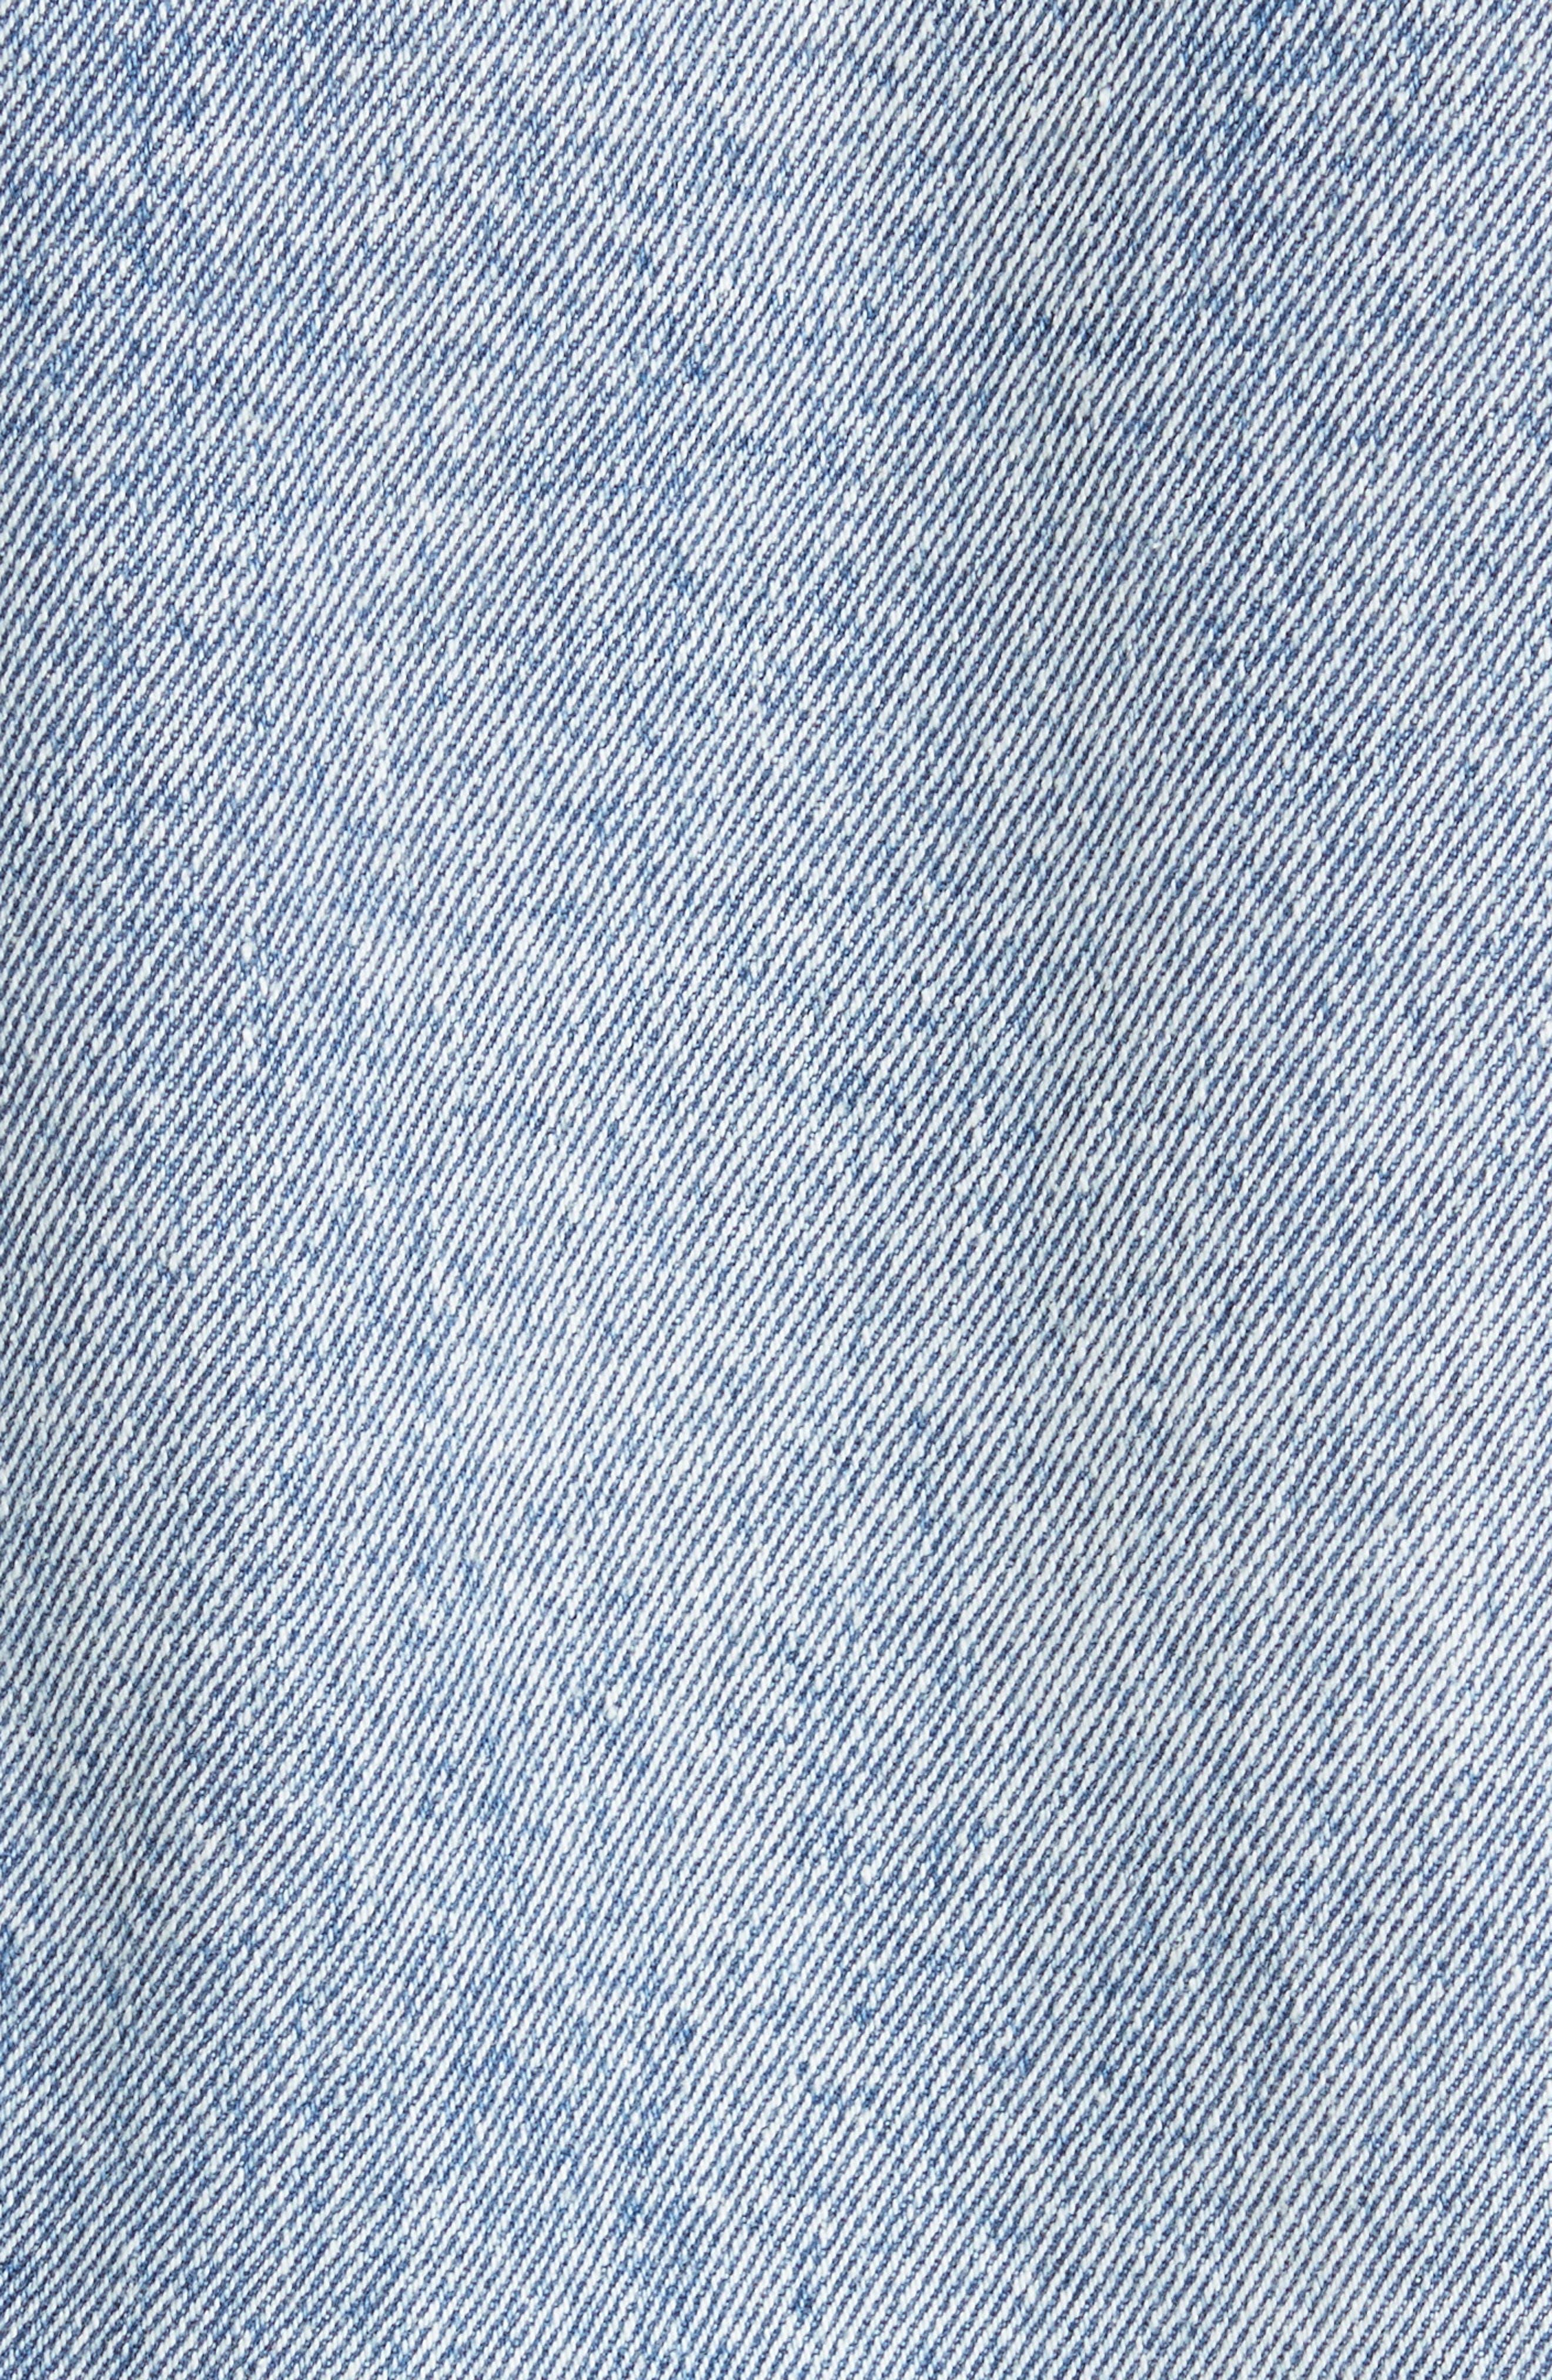 Ruffle Cuff Denim Jacket,                             Alternate thumbnail 6, color,                             401